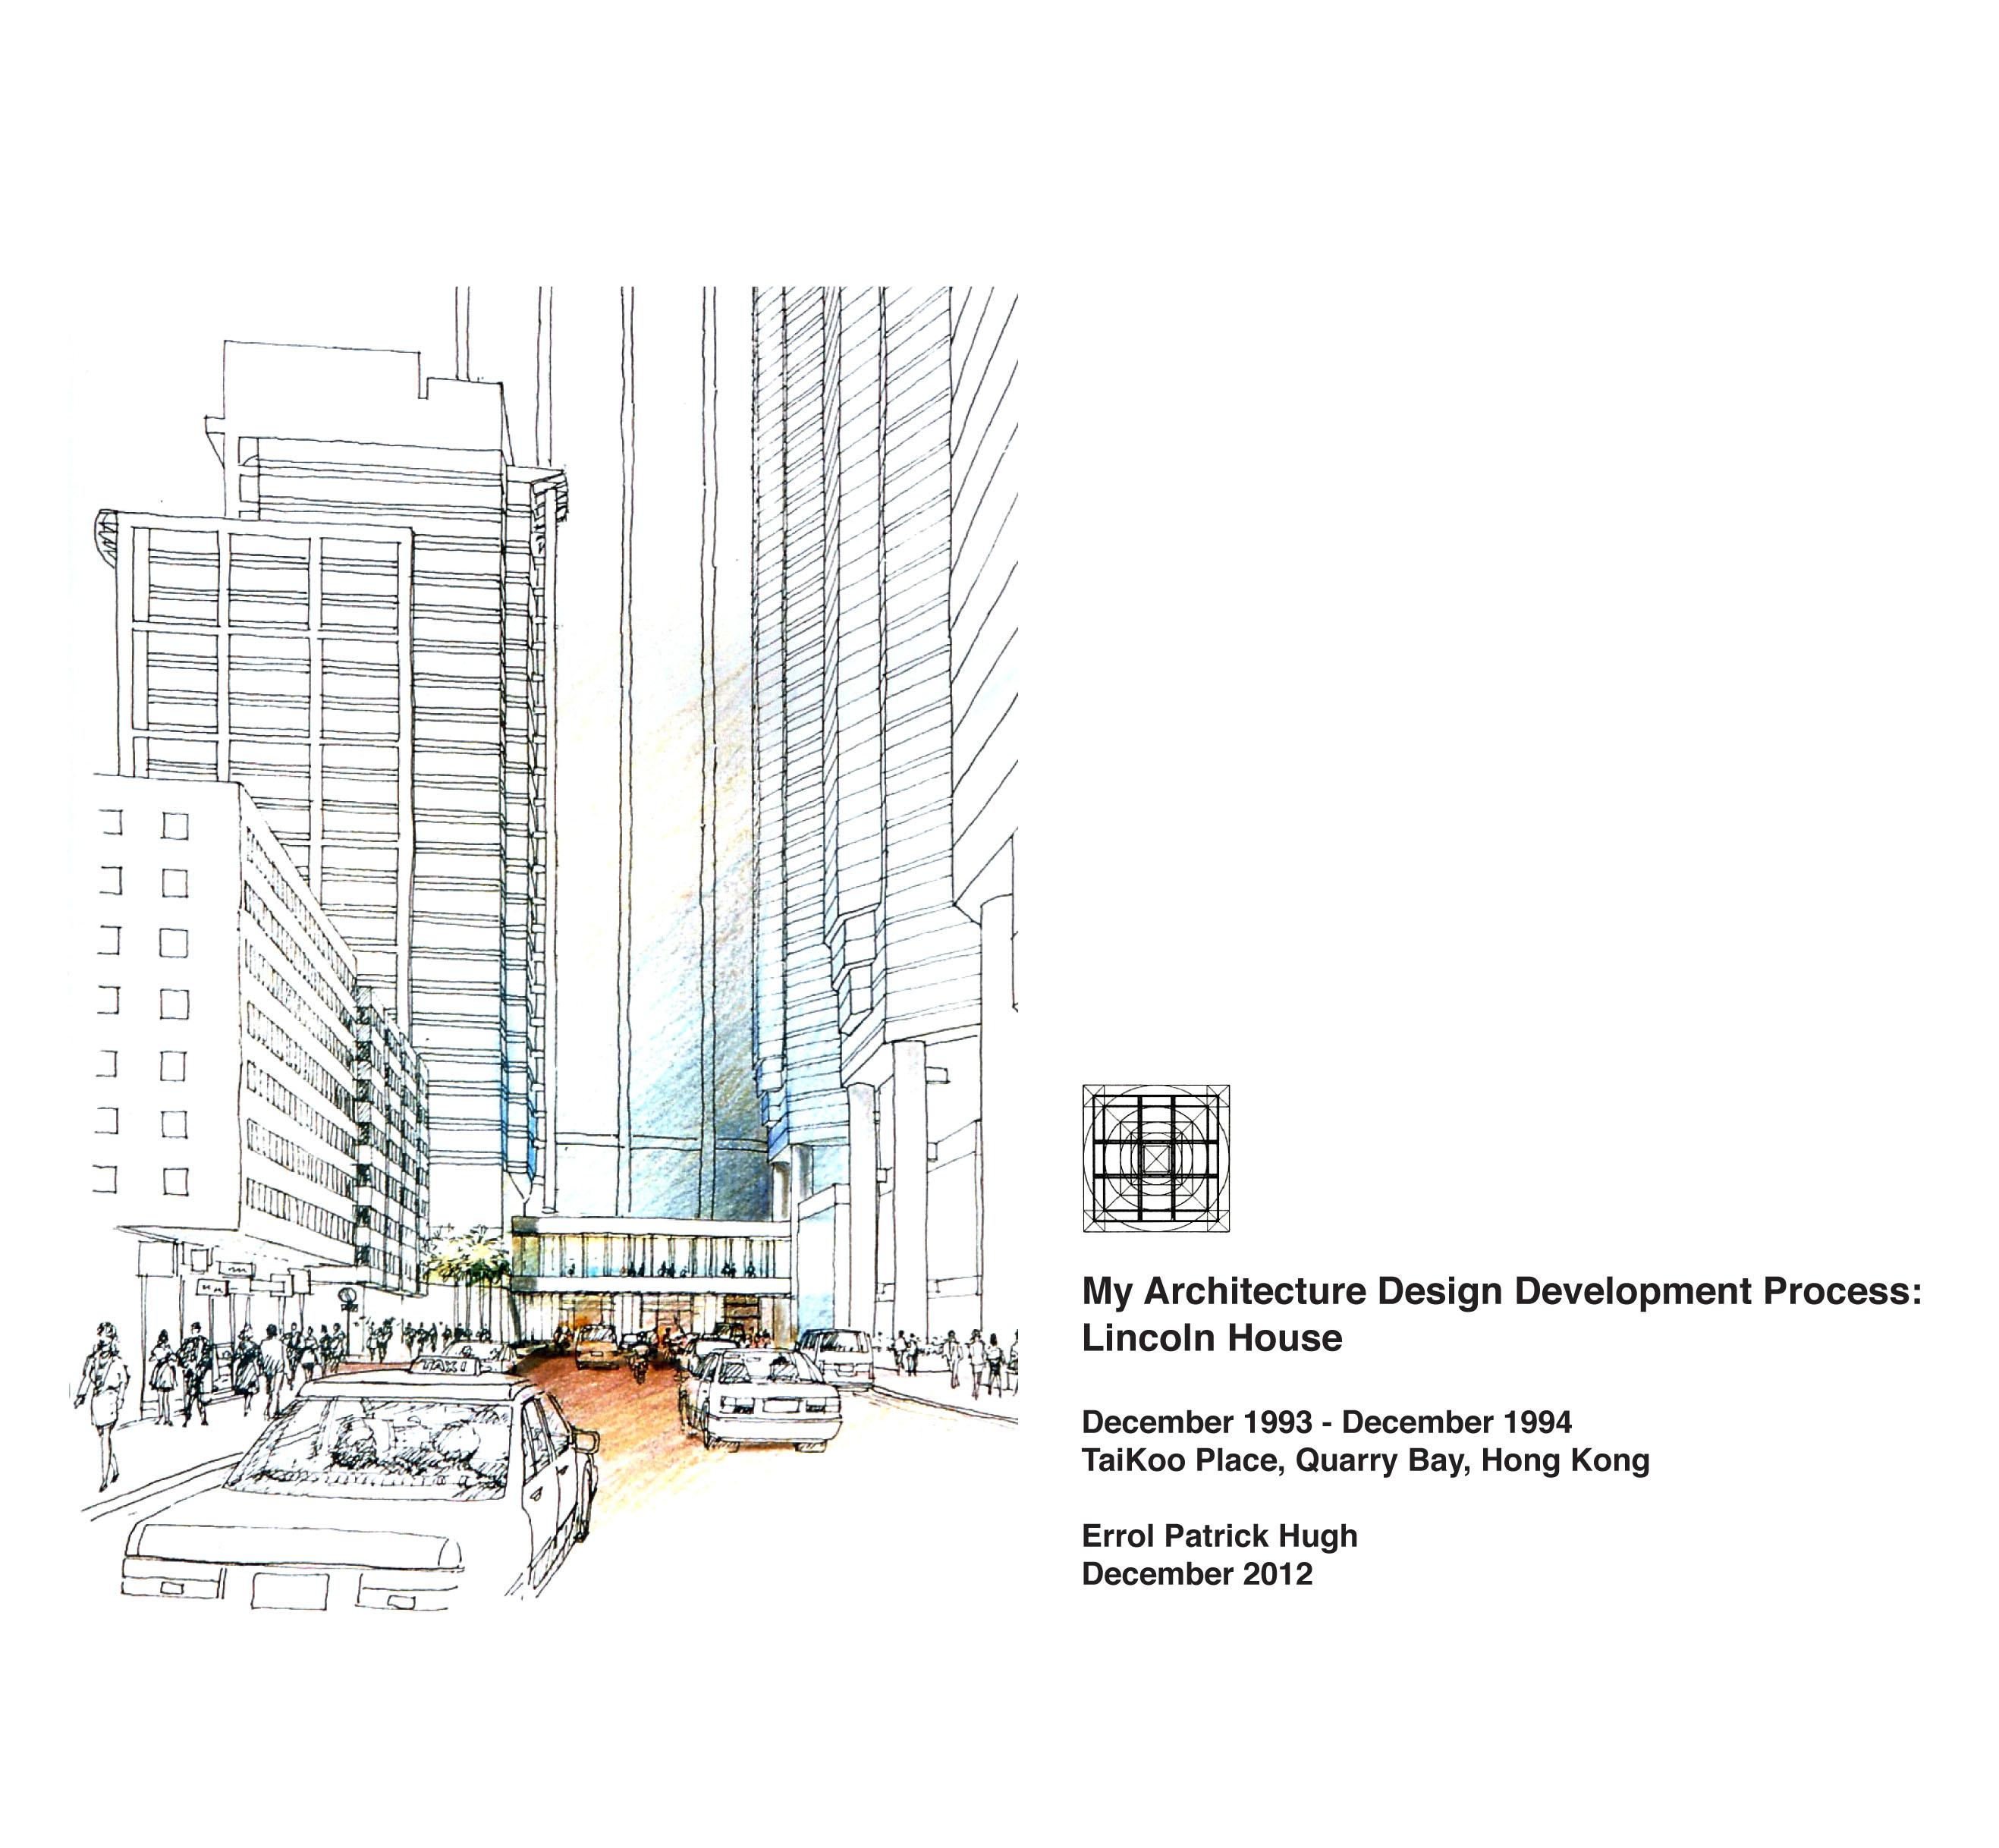 Architecture Design Process my architecture design development process | archi blog